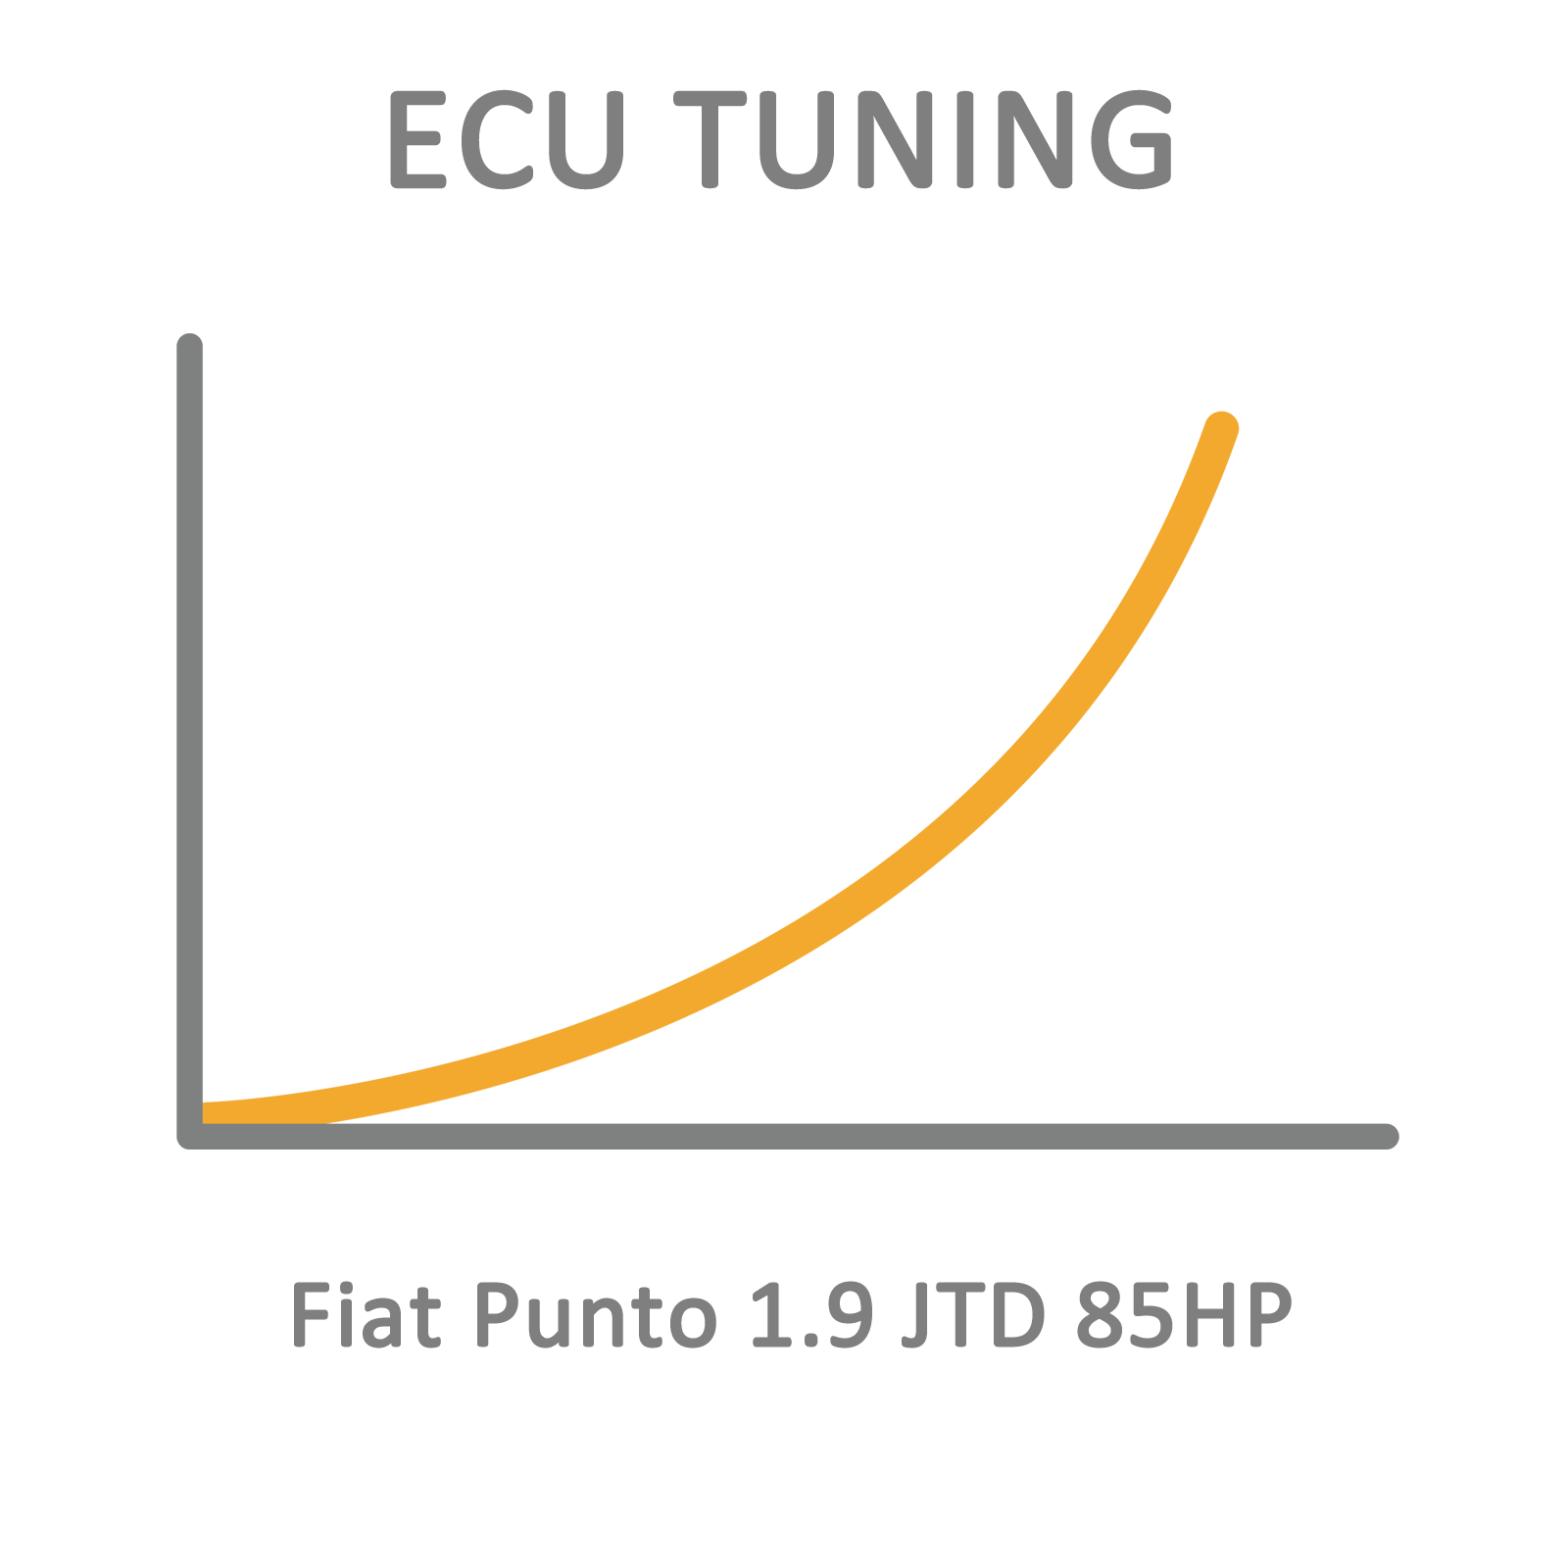 Fiat Punto 1.9 JTD 85HP ECU Tuning Remapping Programming